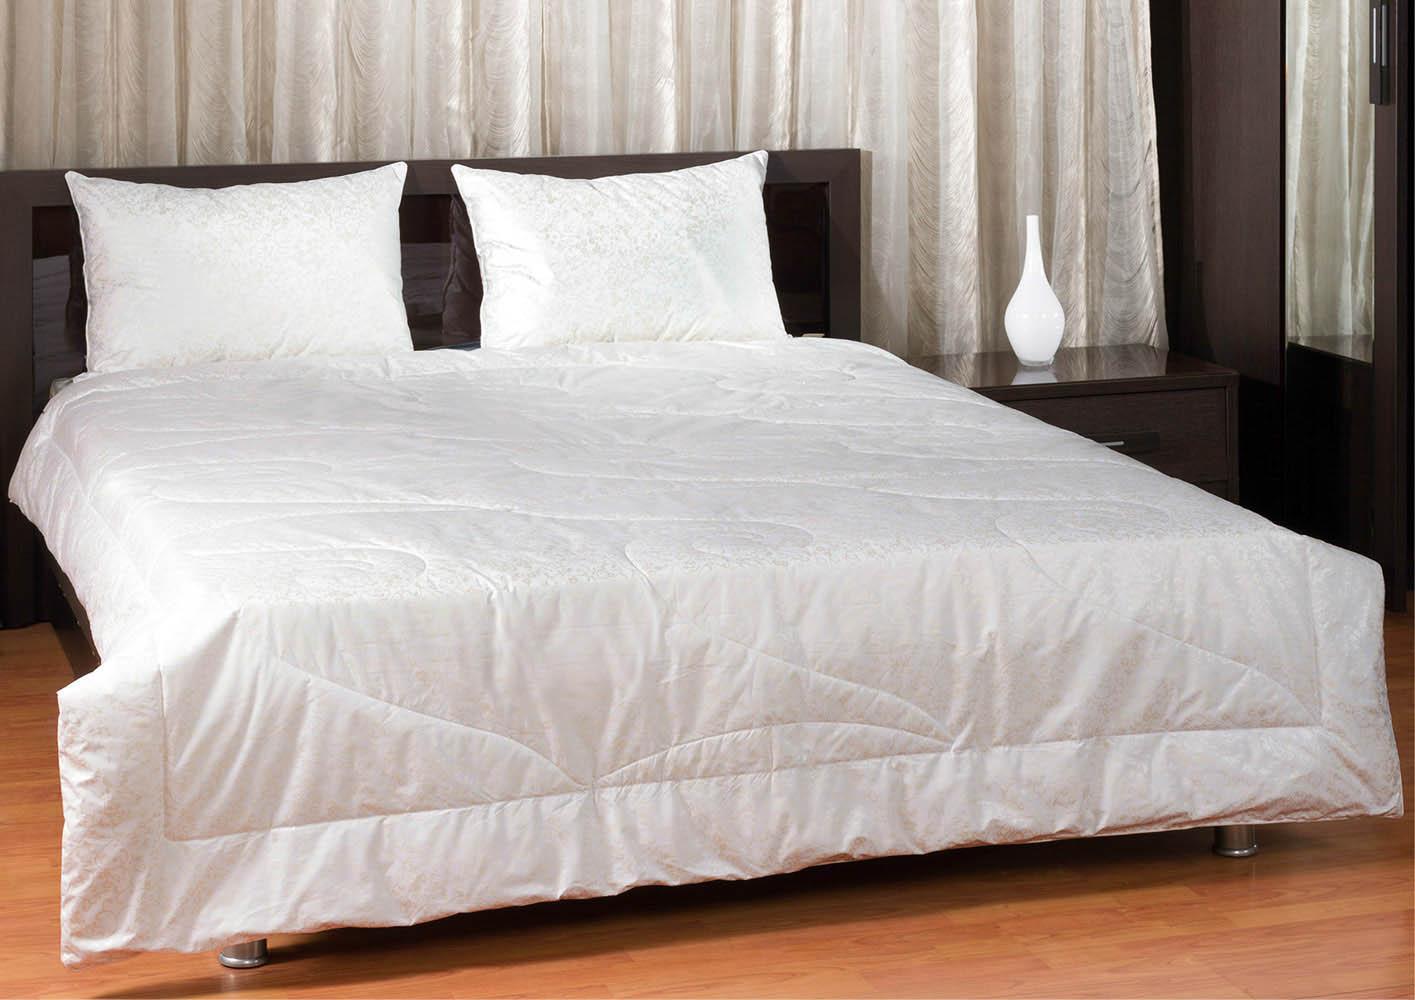 Одеяла Primavelle Одеяло Лебяжий Пух Цвет: Белый (200х220 см)